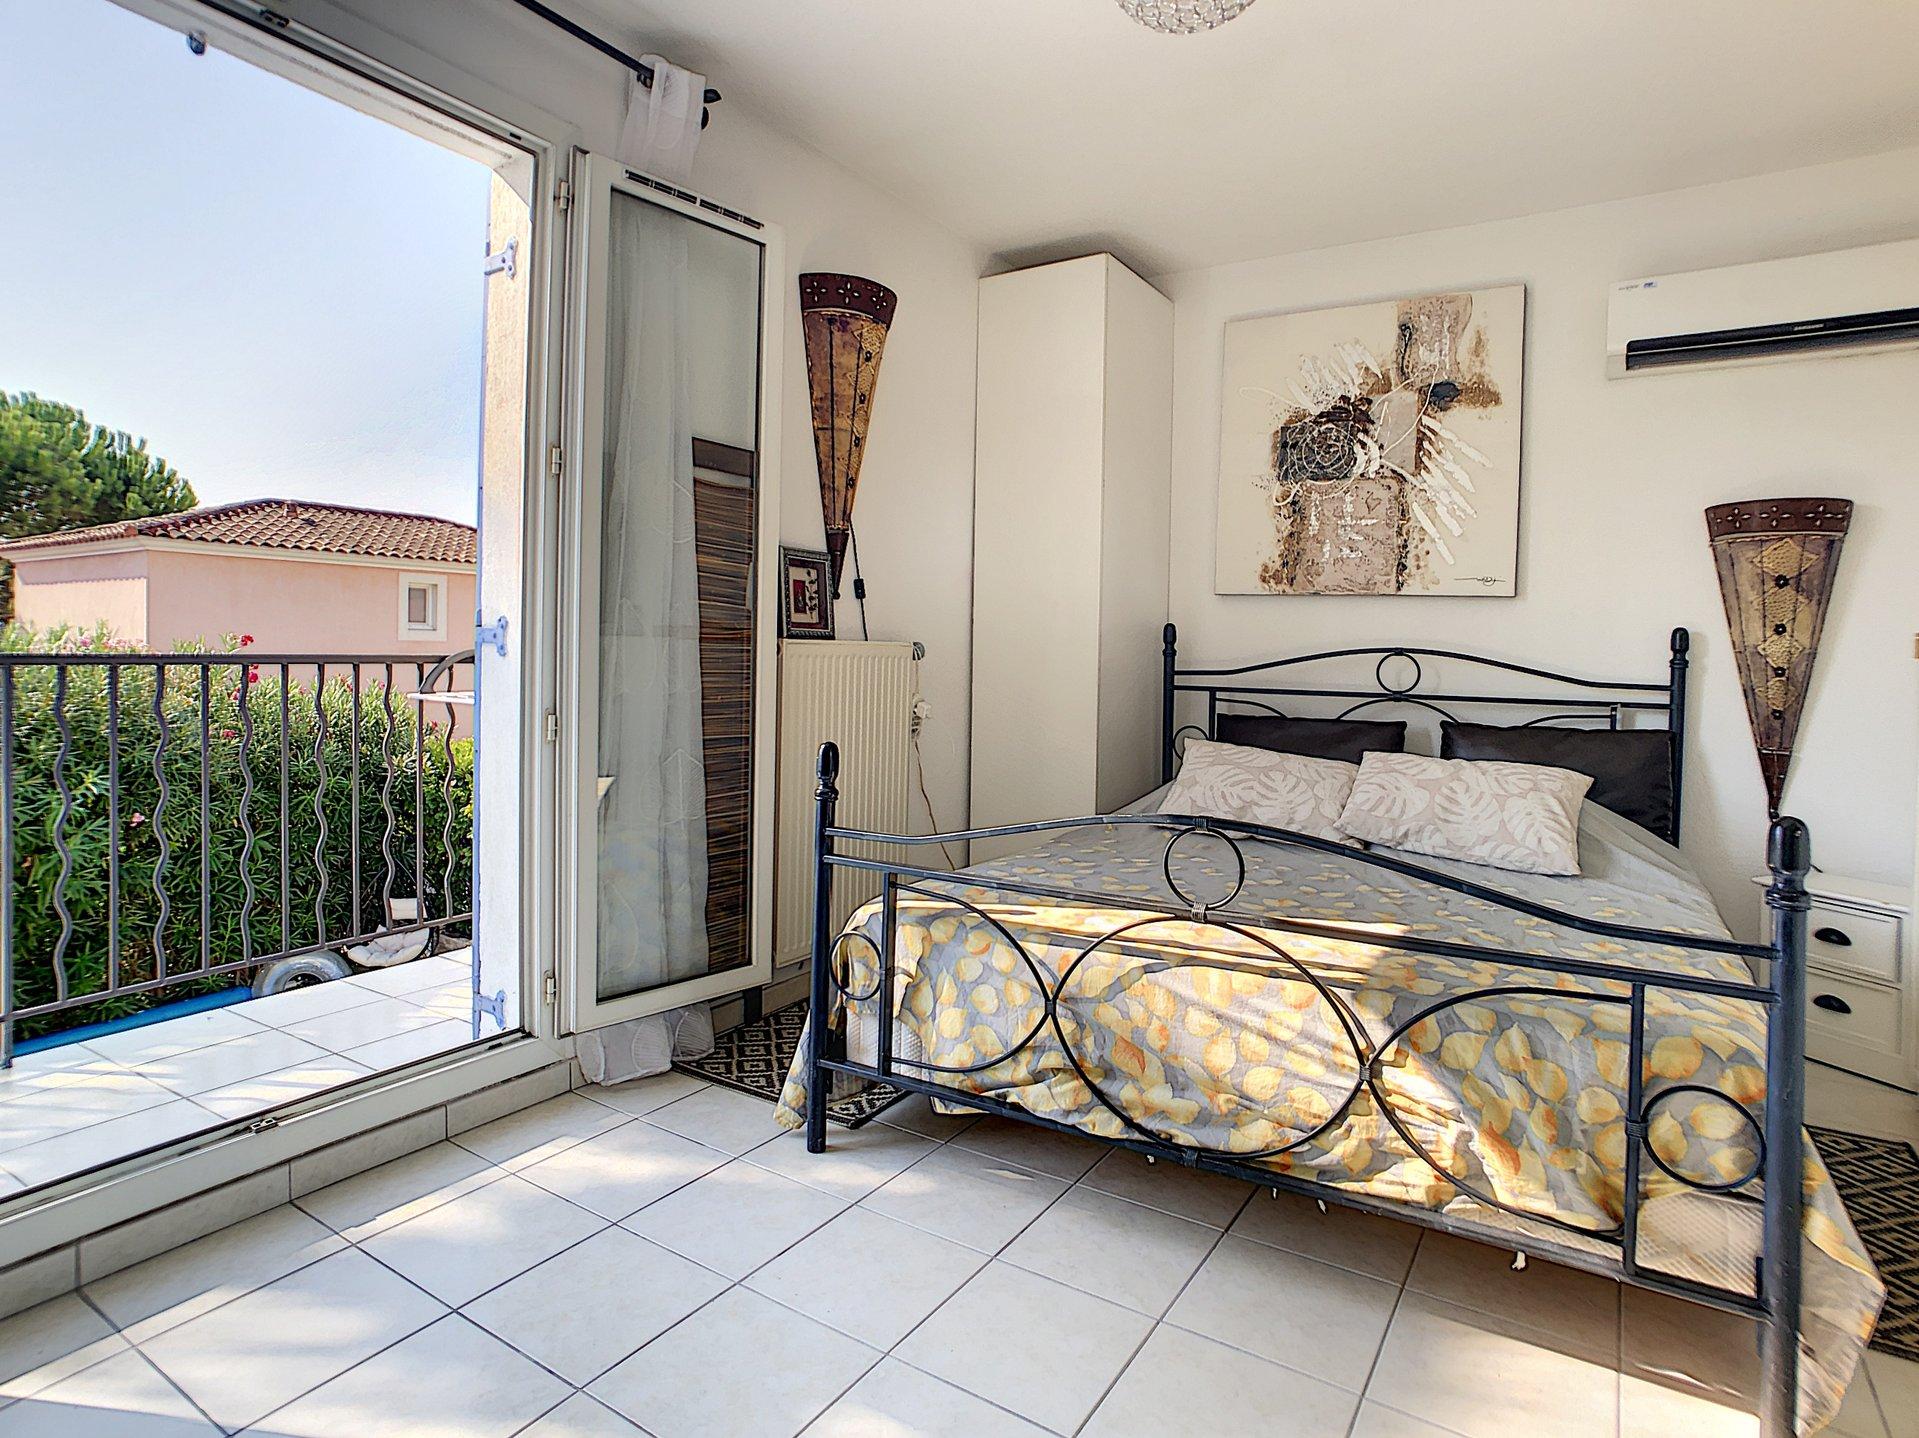 Cannes La Bocca, 3 bedrooms house